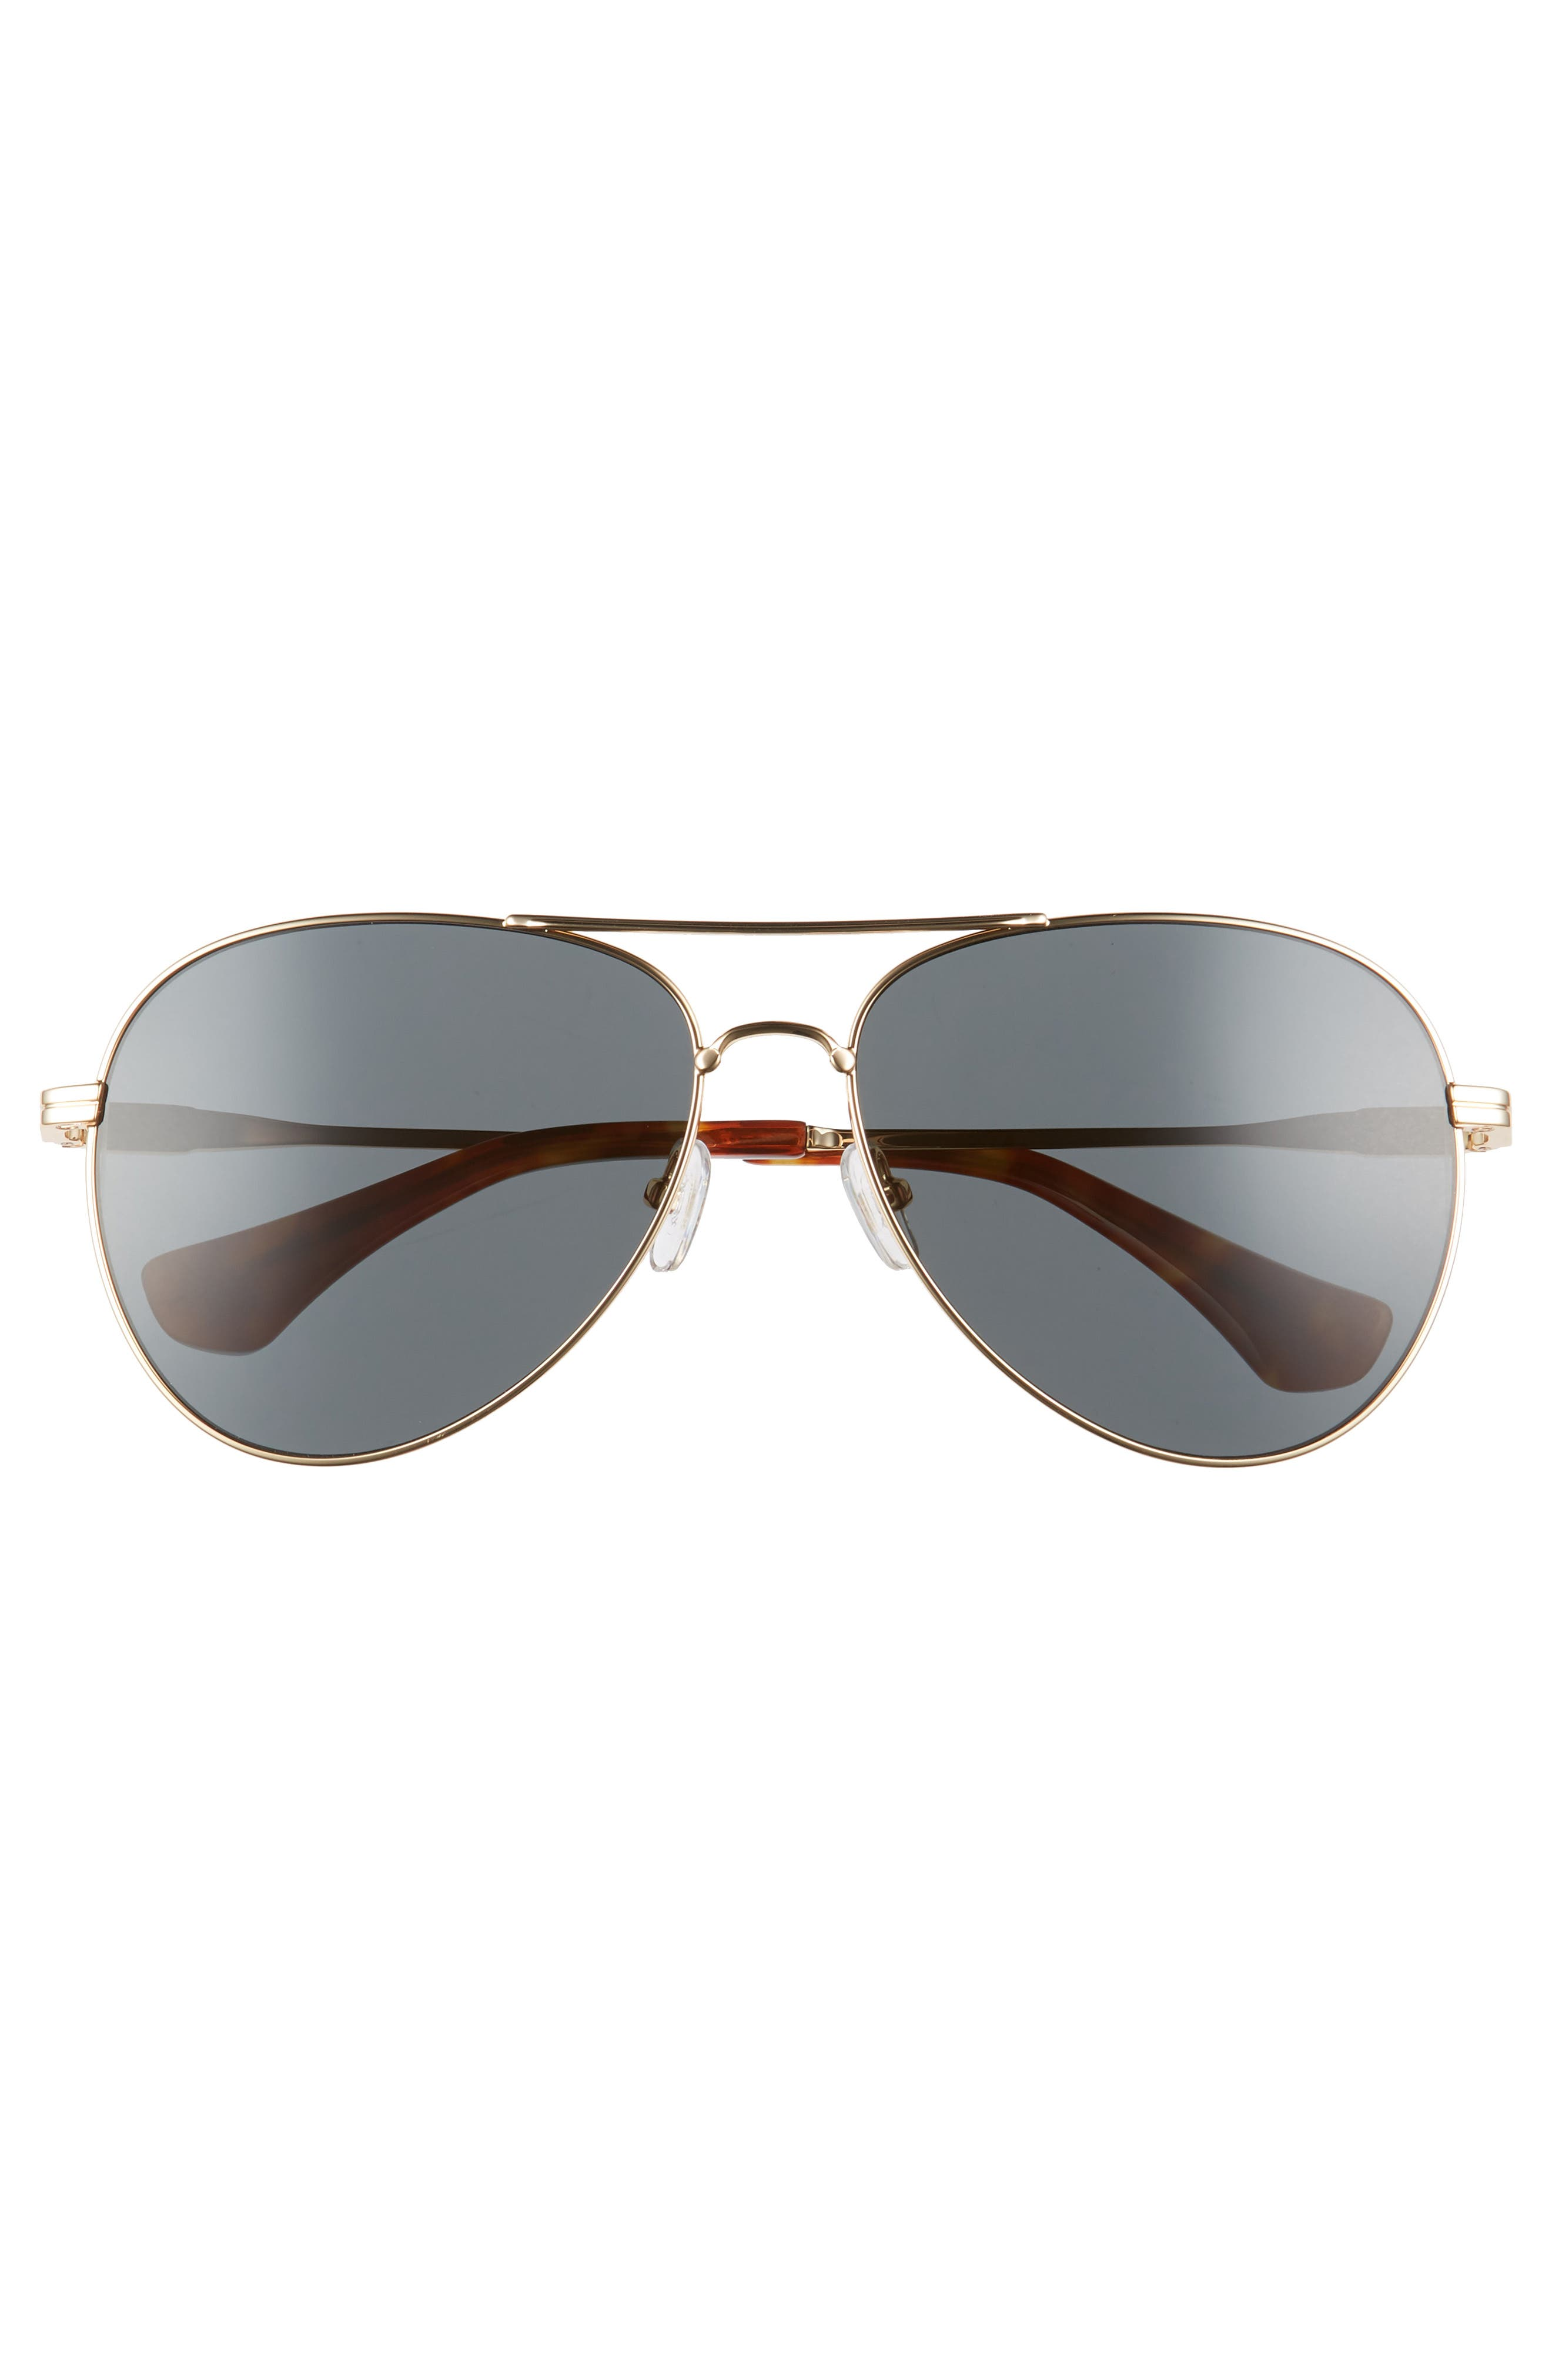 Lodi 61mm Mirrored Aviator Sunglasses,                             Alternate thumbnail 3, color,                             714